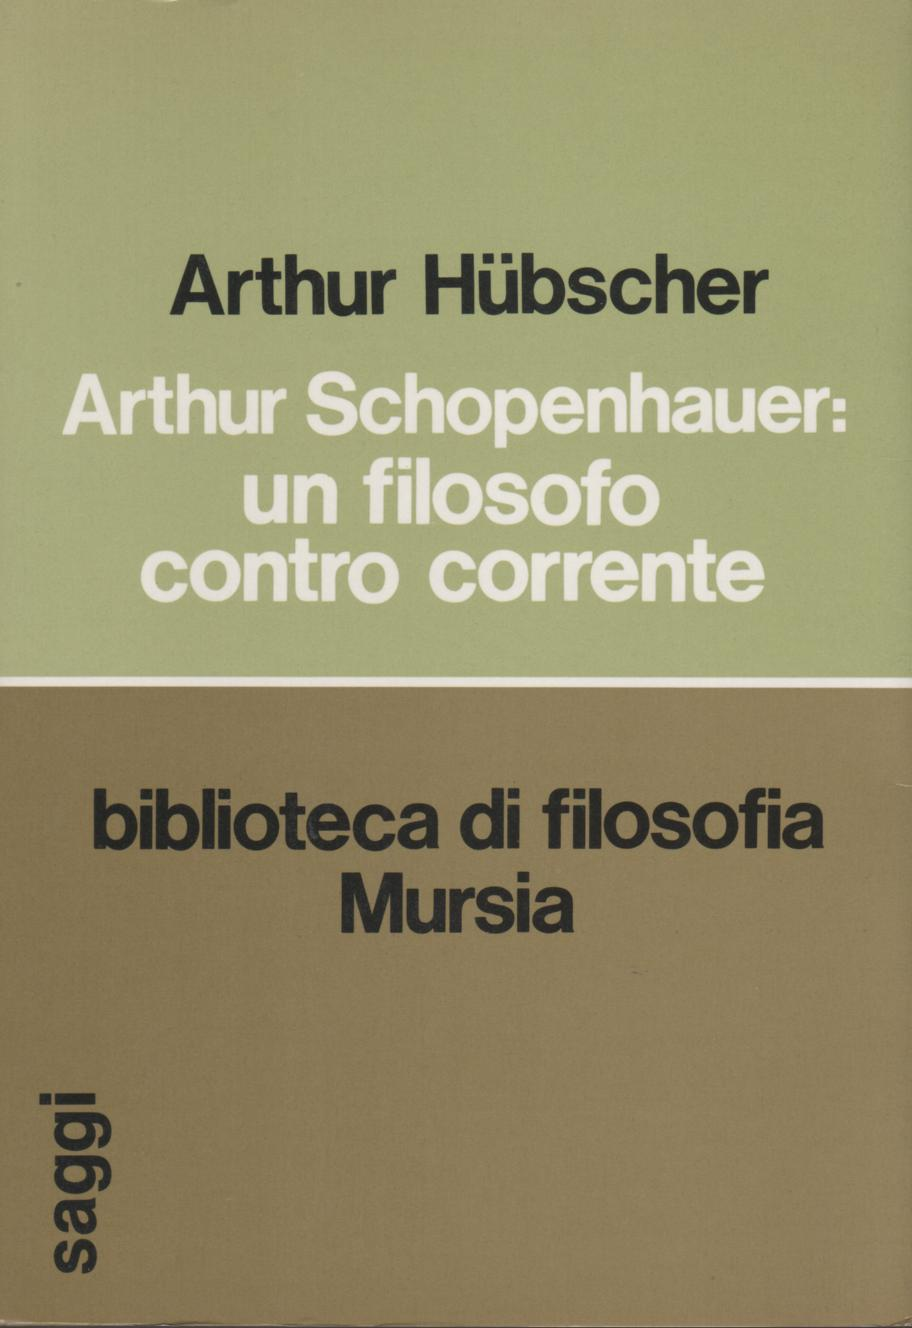 Arthur Schopenhauer: un filosofo contro corrente